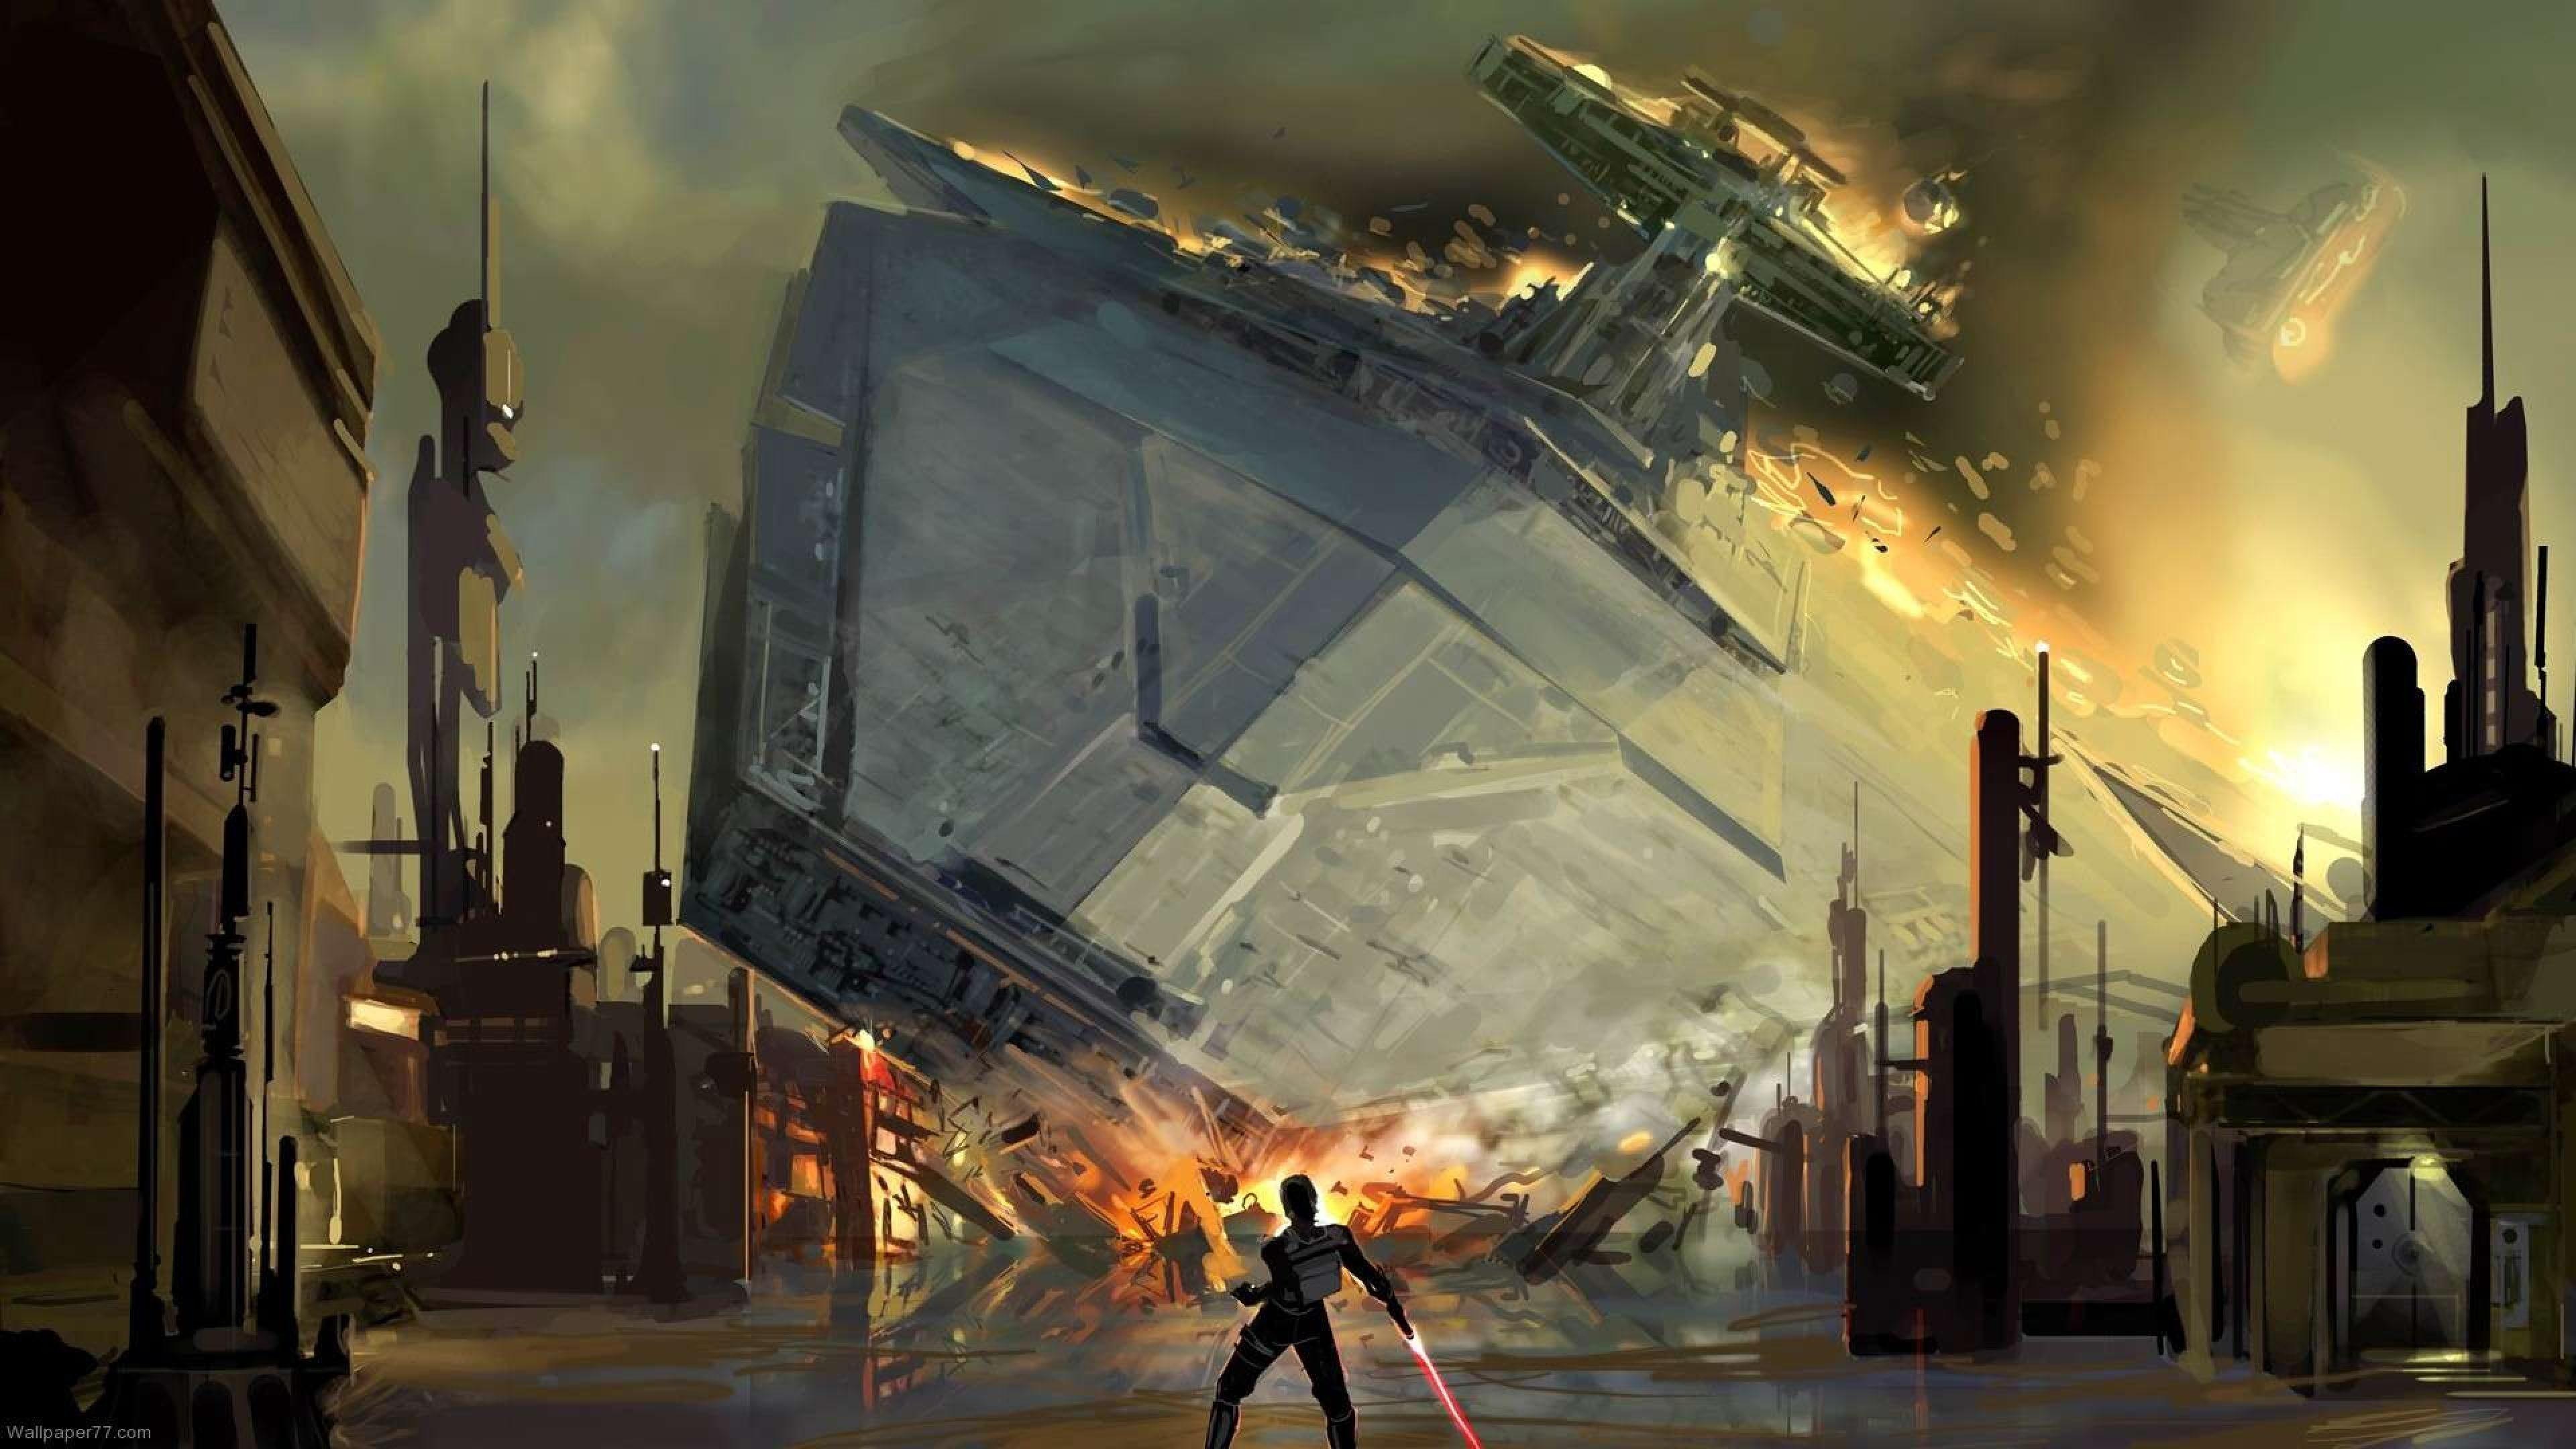 star wars concept art wallpaper